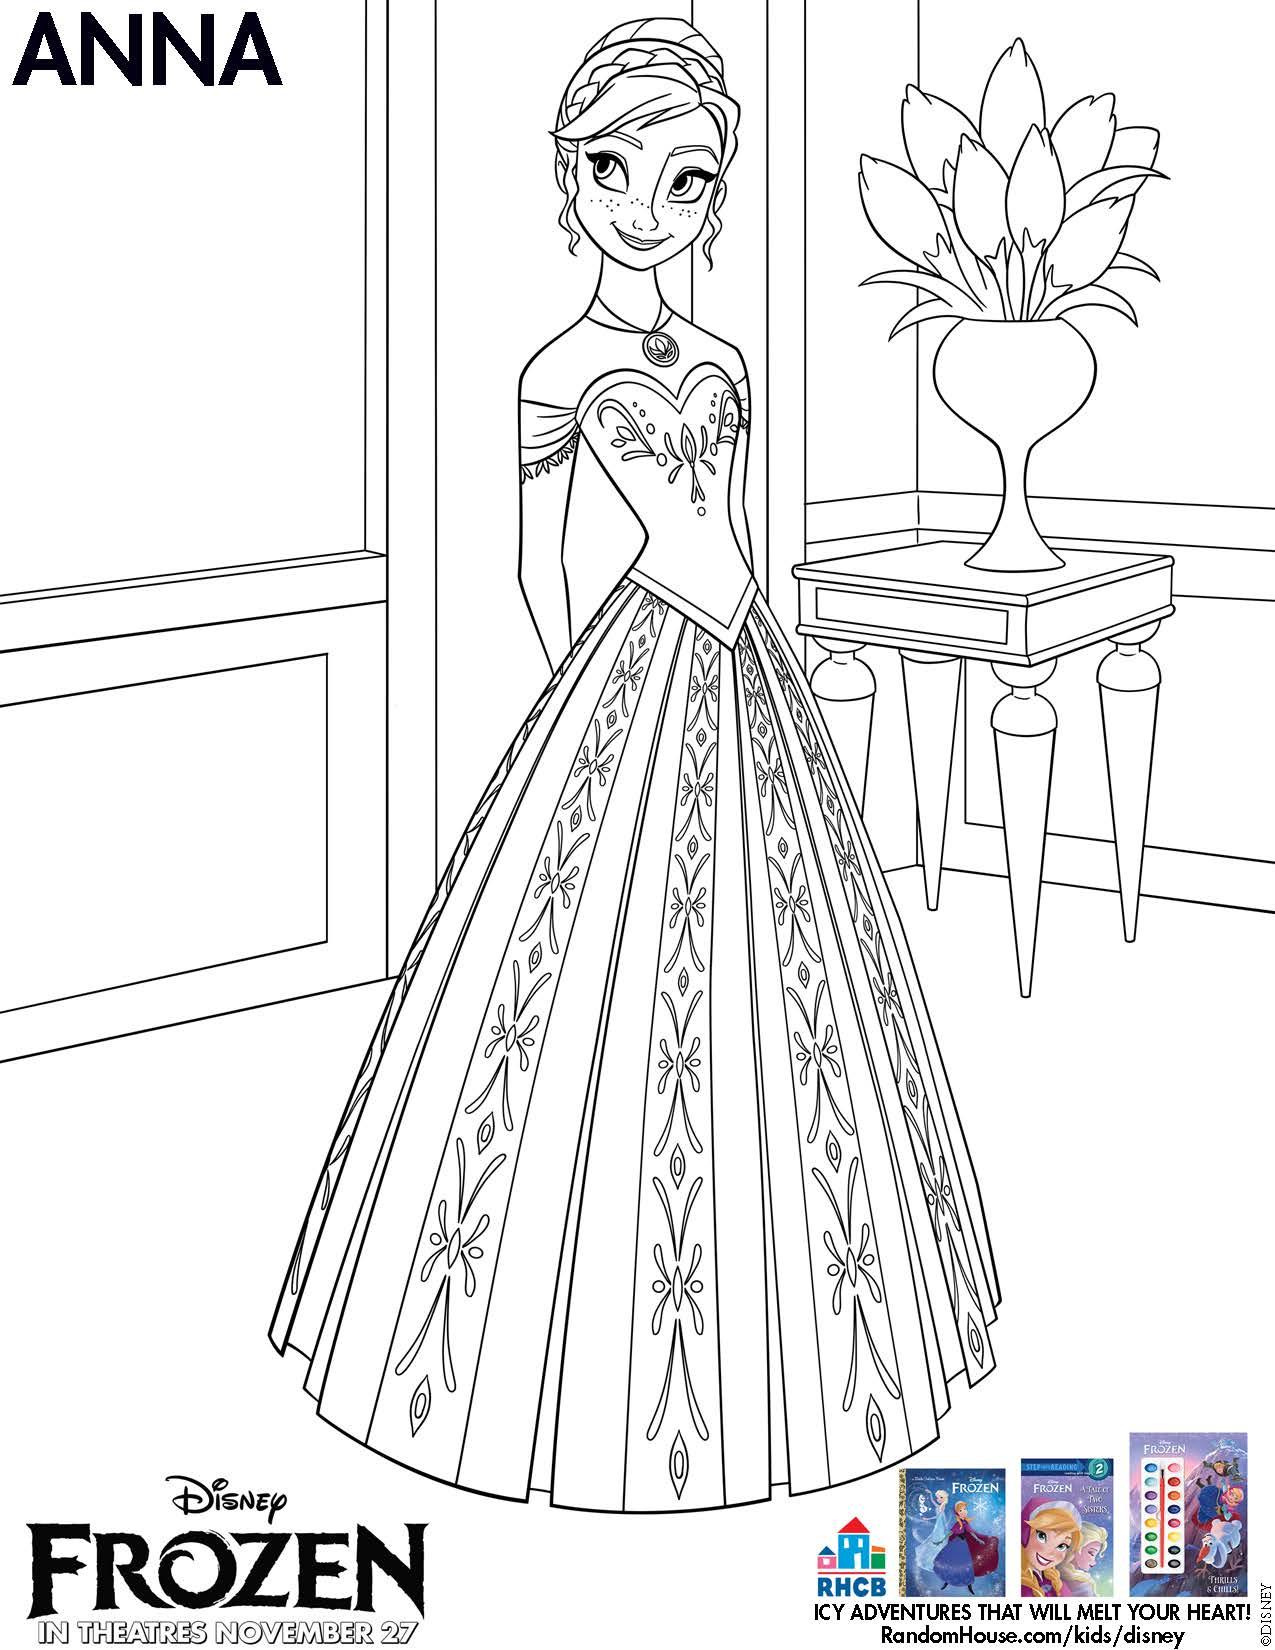 Frozen Coloring Pages Pdf Download : Frozen coloring pages pdf home